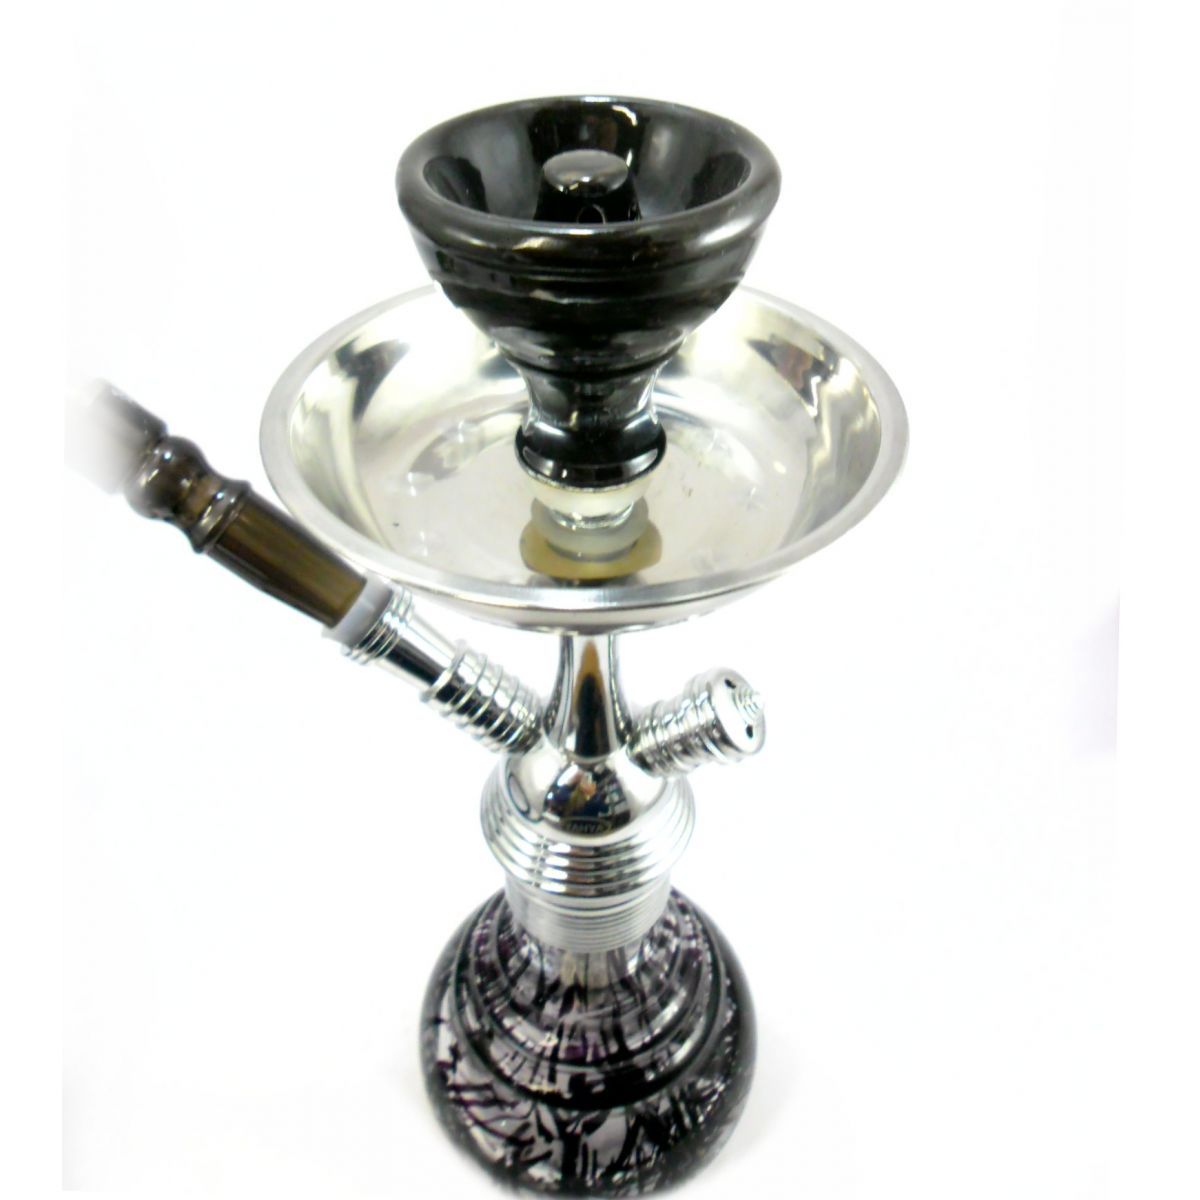 Narguile Yahya 34 cm, inox cromado. Vaso PRETO murano rosqueado. Mangueira extensível Rosh Vortex. MV34_1MANG_PRETO